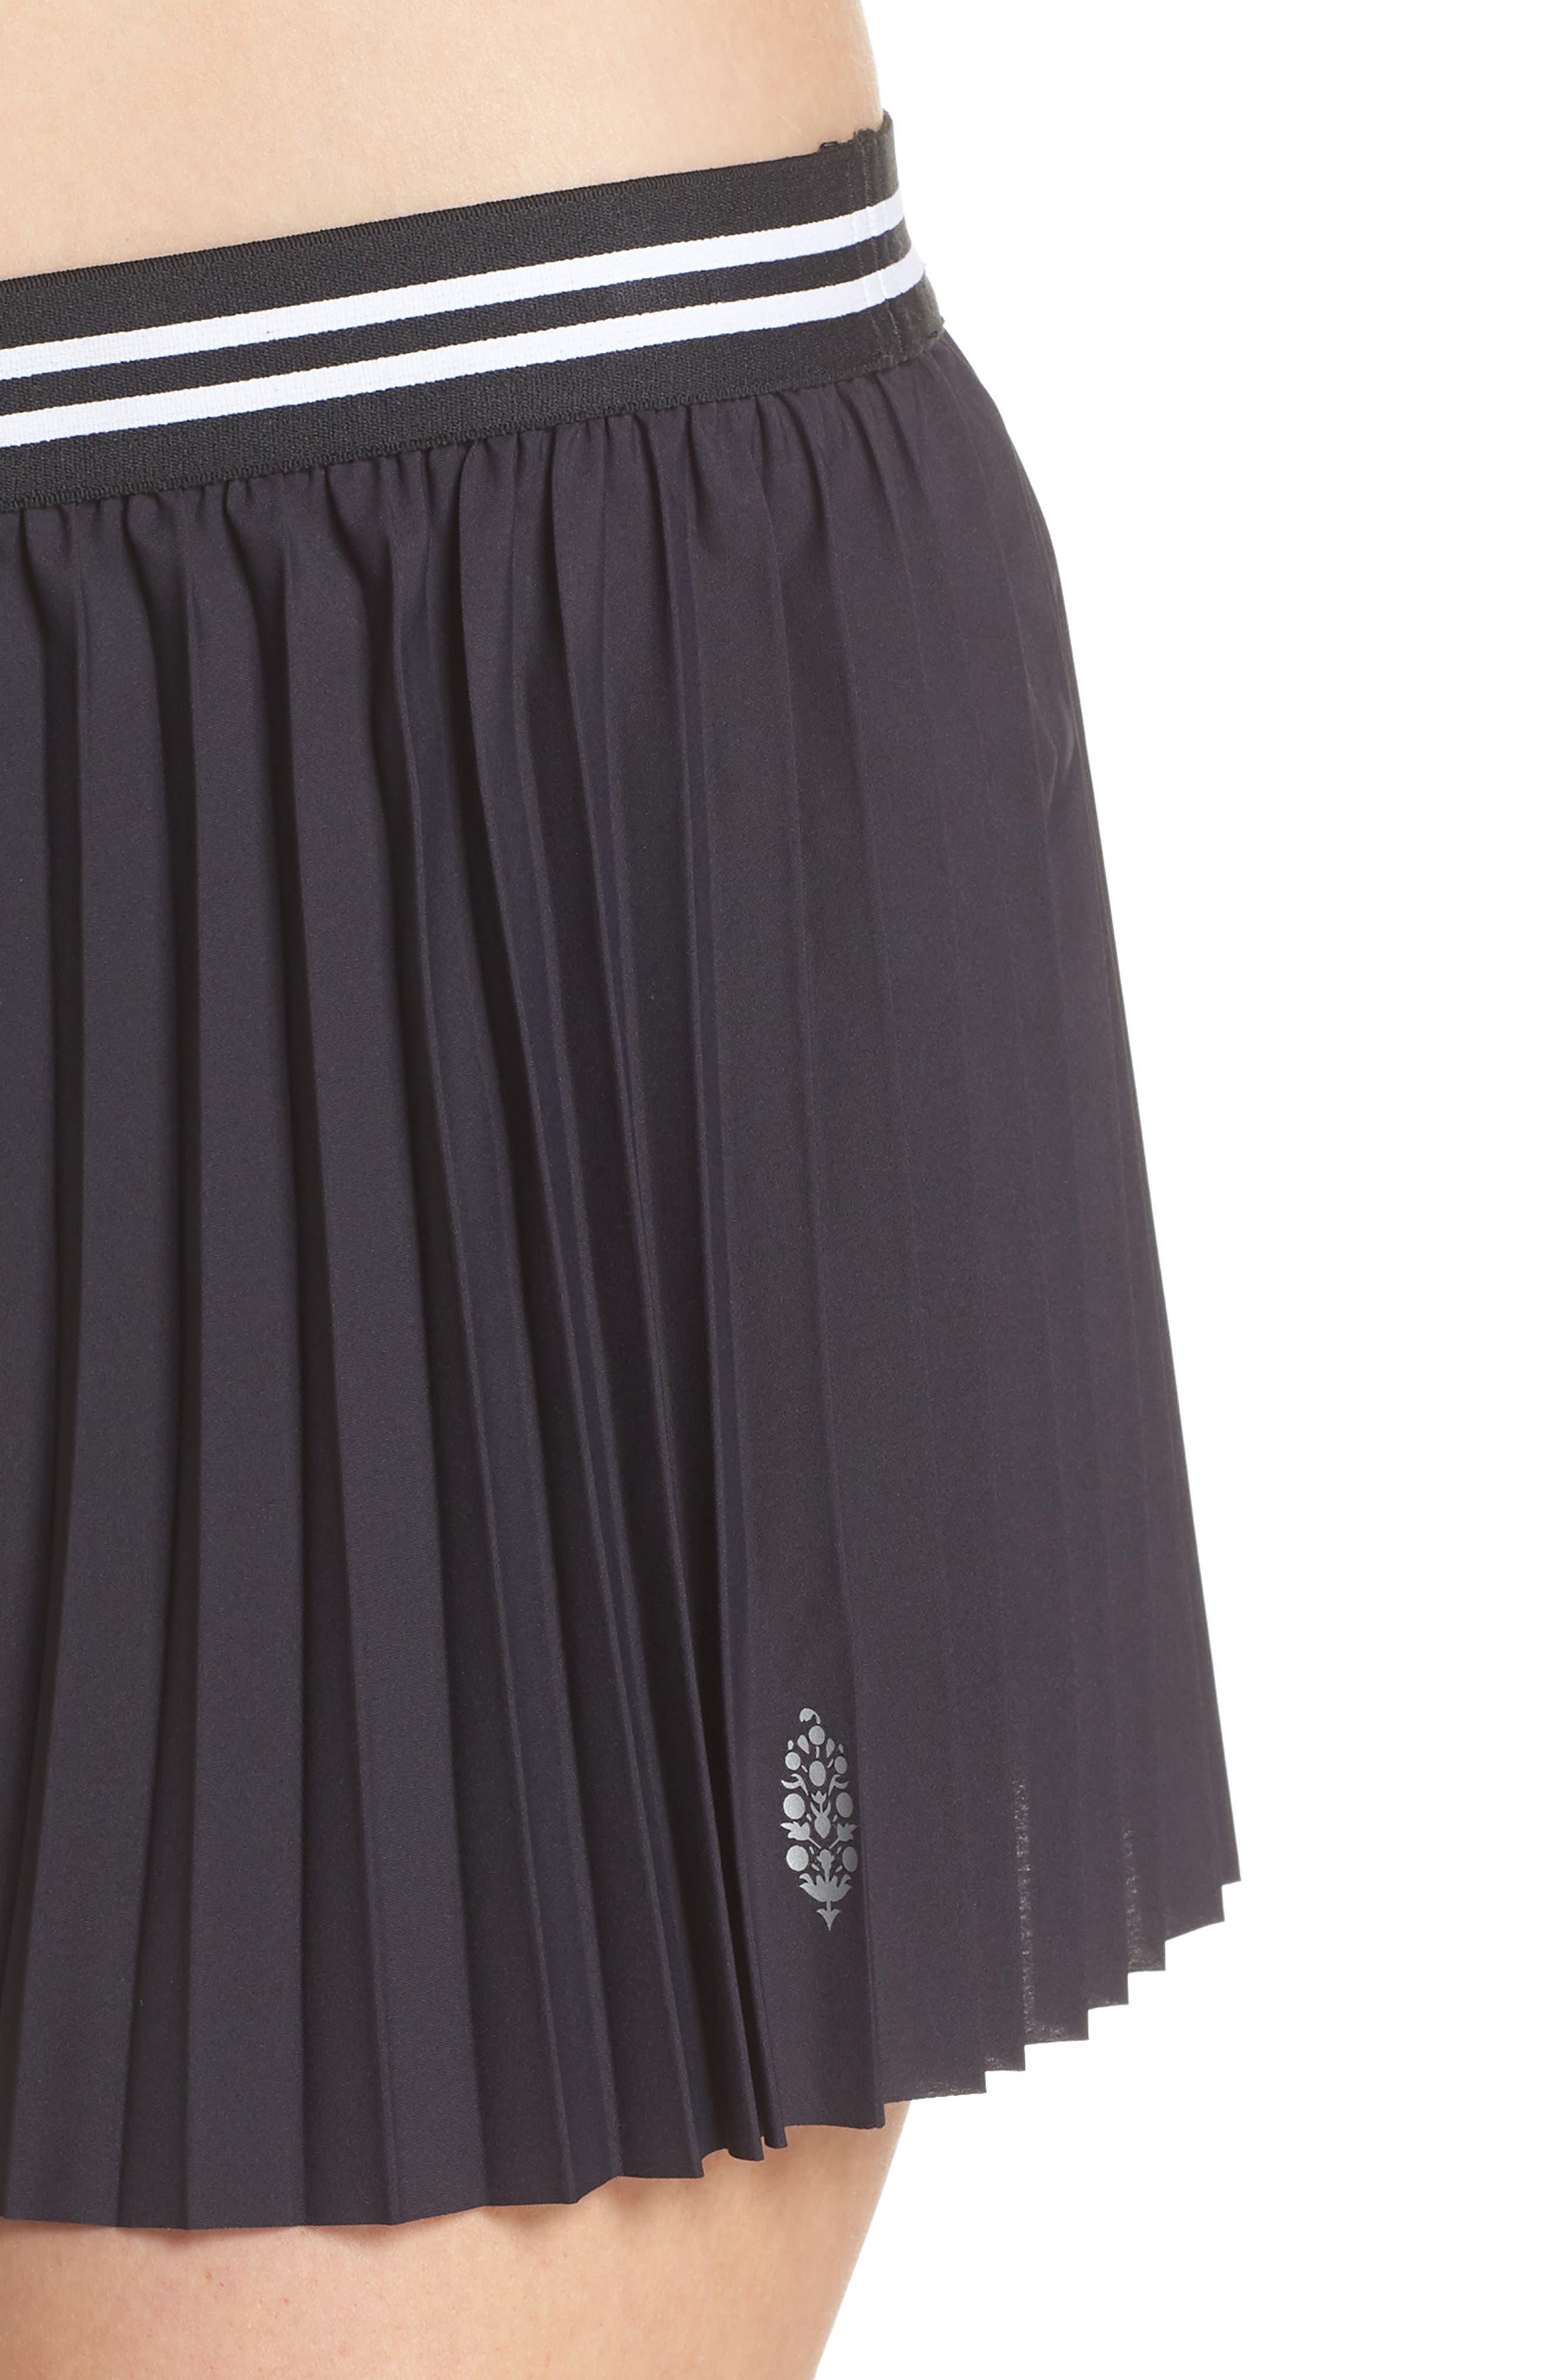 Free People Zephyr Shorts,                             Alternate thumbnail 4, color,                             Black